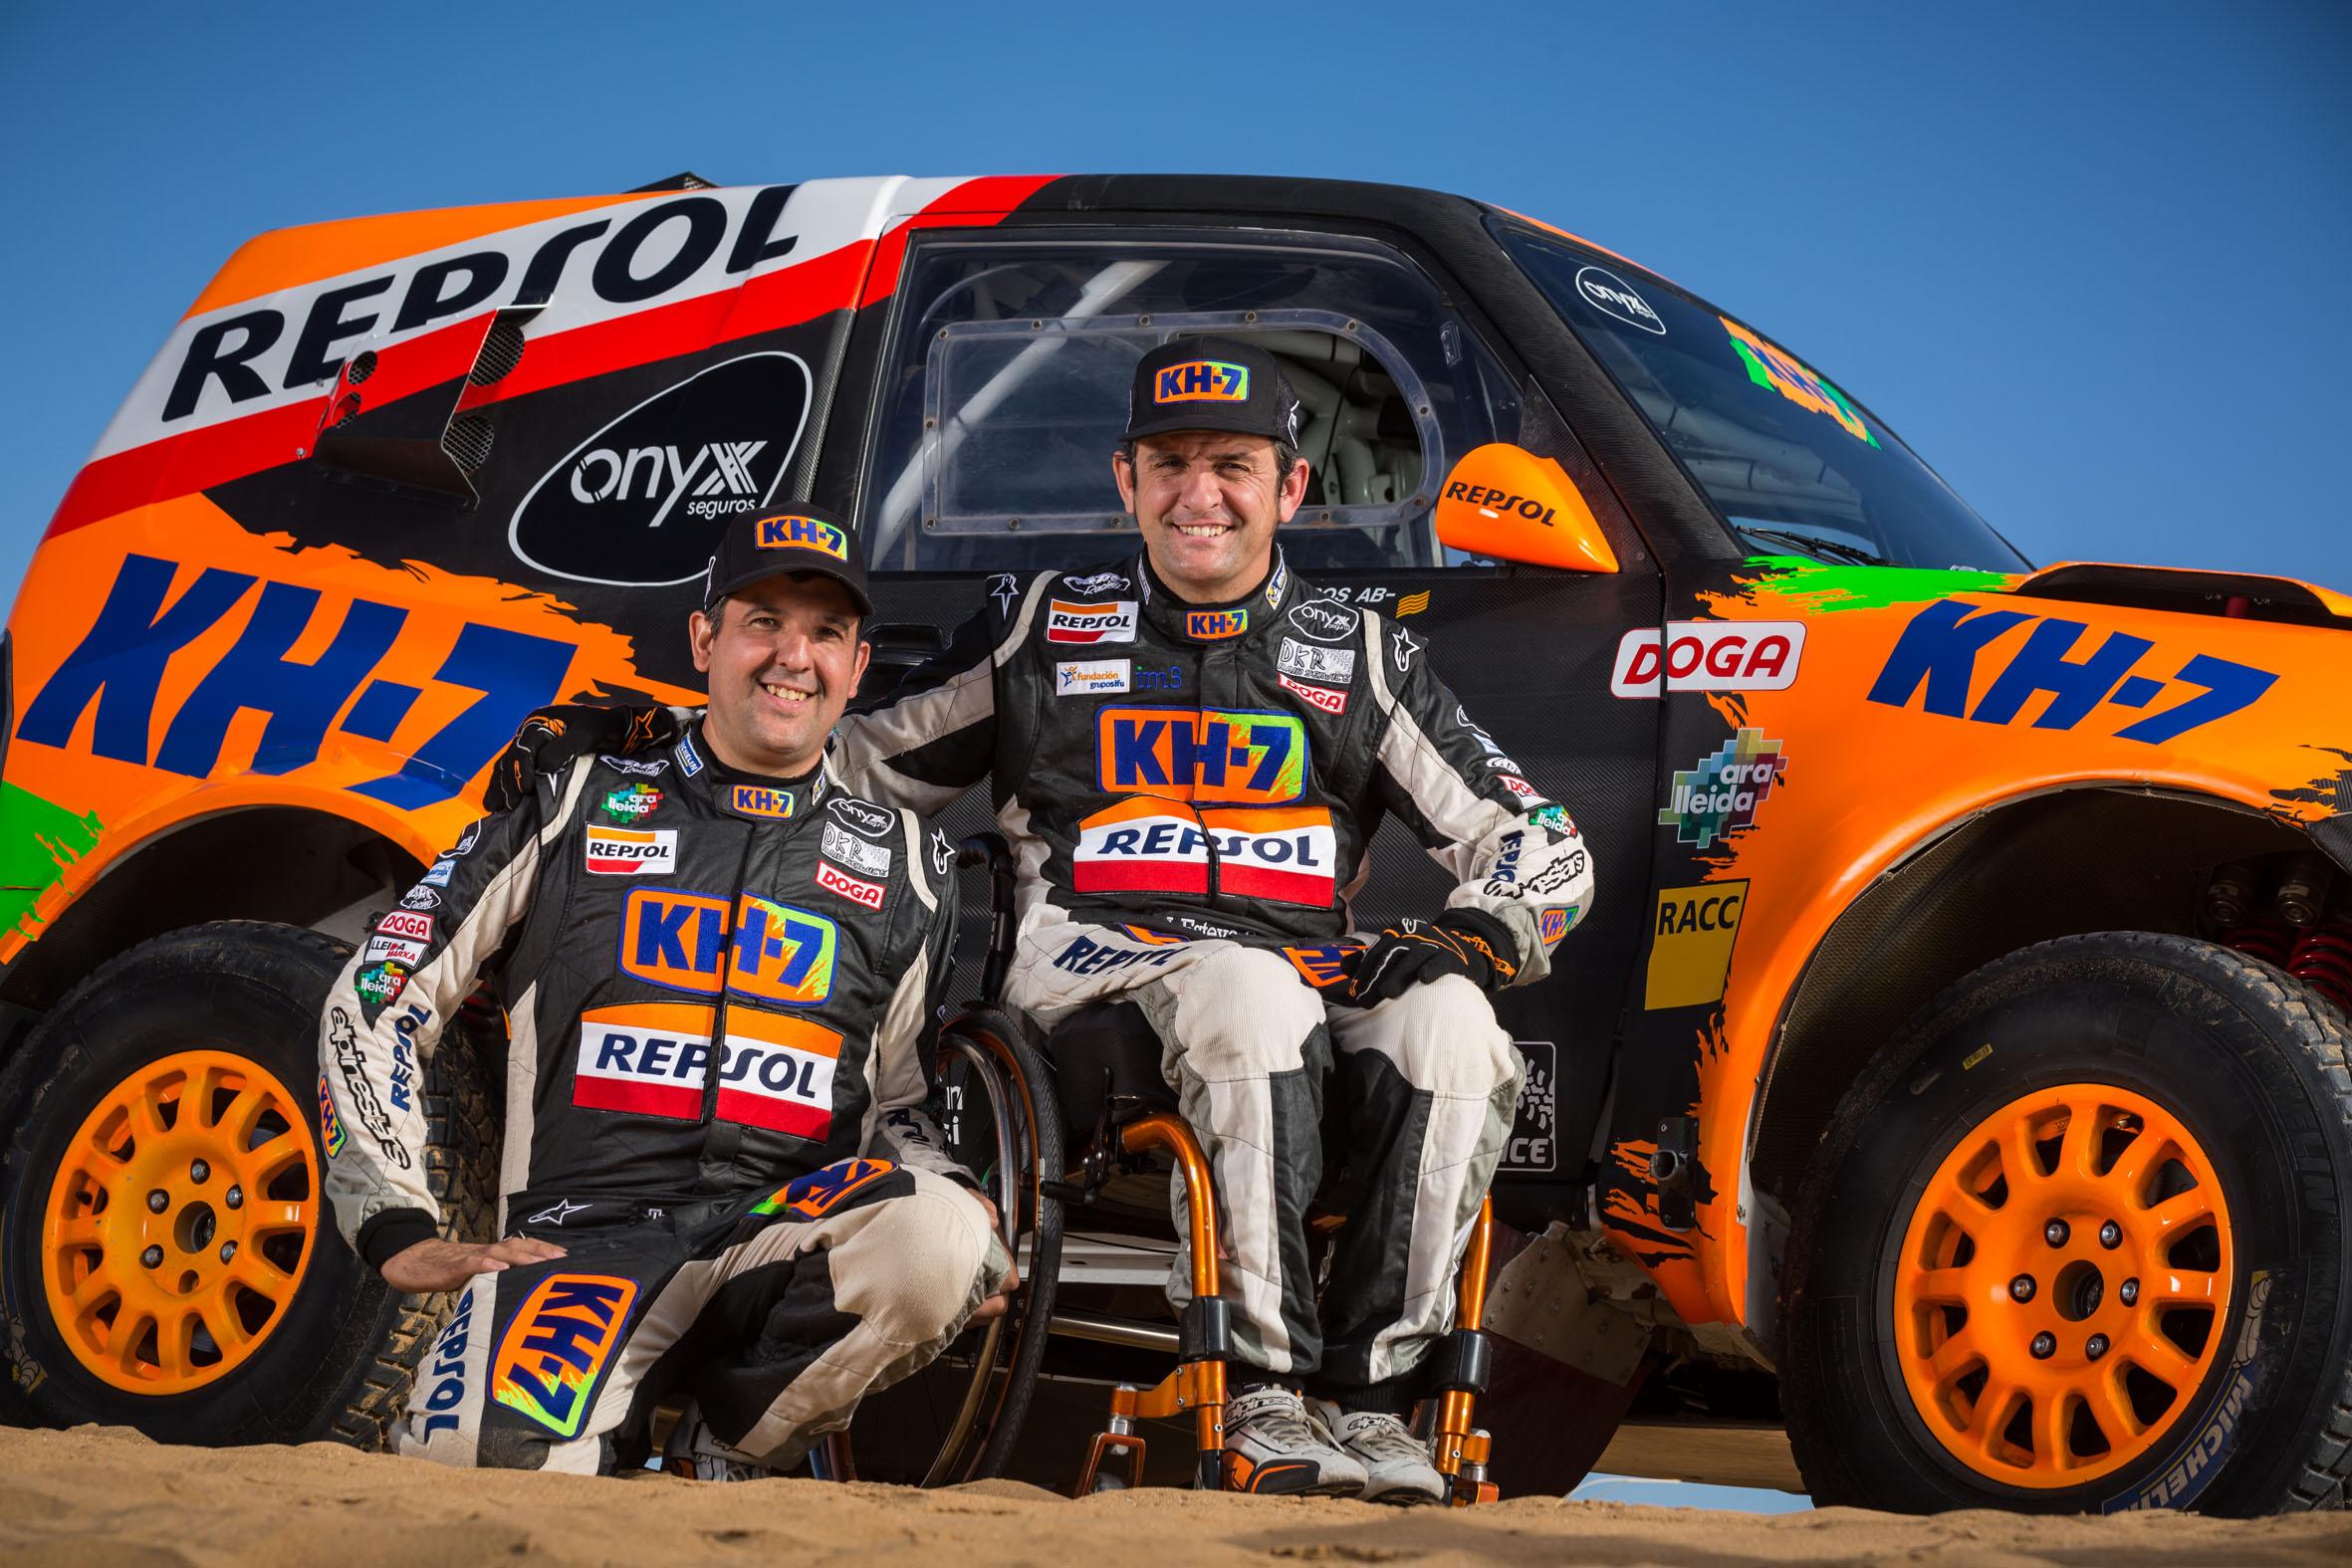 2017 Rallye Raid Dakar Paraguay - Bolivia - Argentina [2-14 Enero] - Página 3 Isidre_Esteve_Test_Marruecos_6